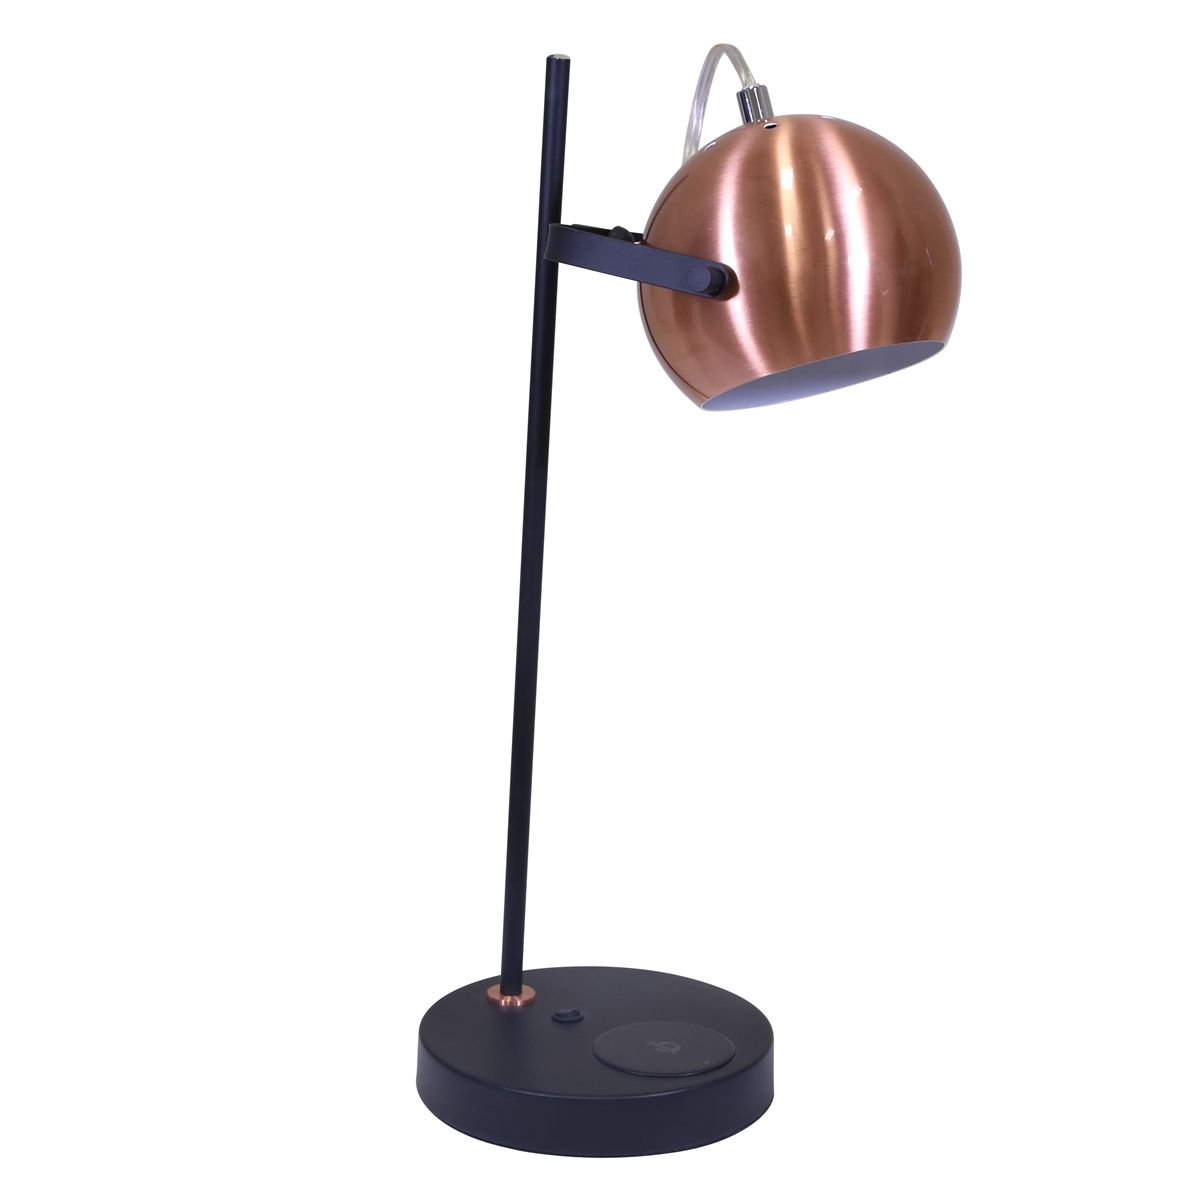 Copper Matte Black Desk Lamp With Usb Wireless Charger Sagebrookhome Www Sagebrookhome Com Lamp Lighting Black Desk Lamps Lamp Task Lamps